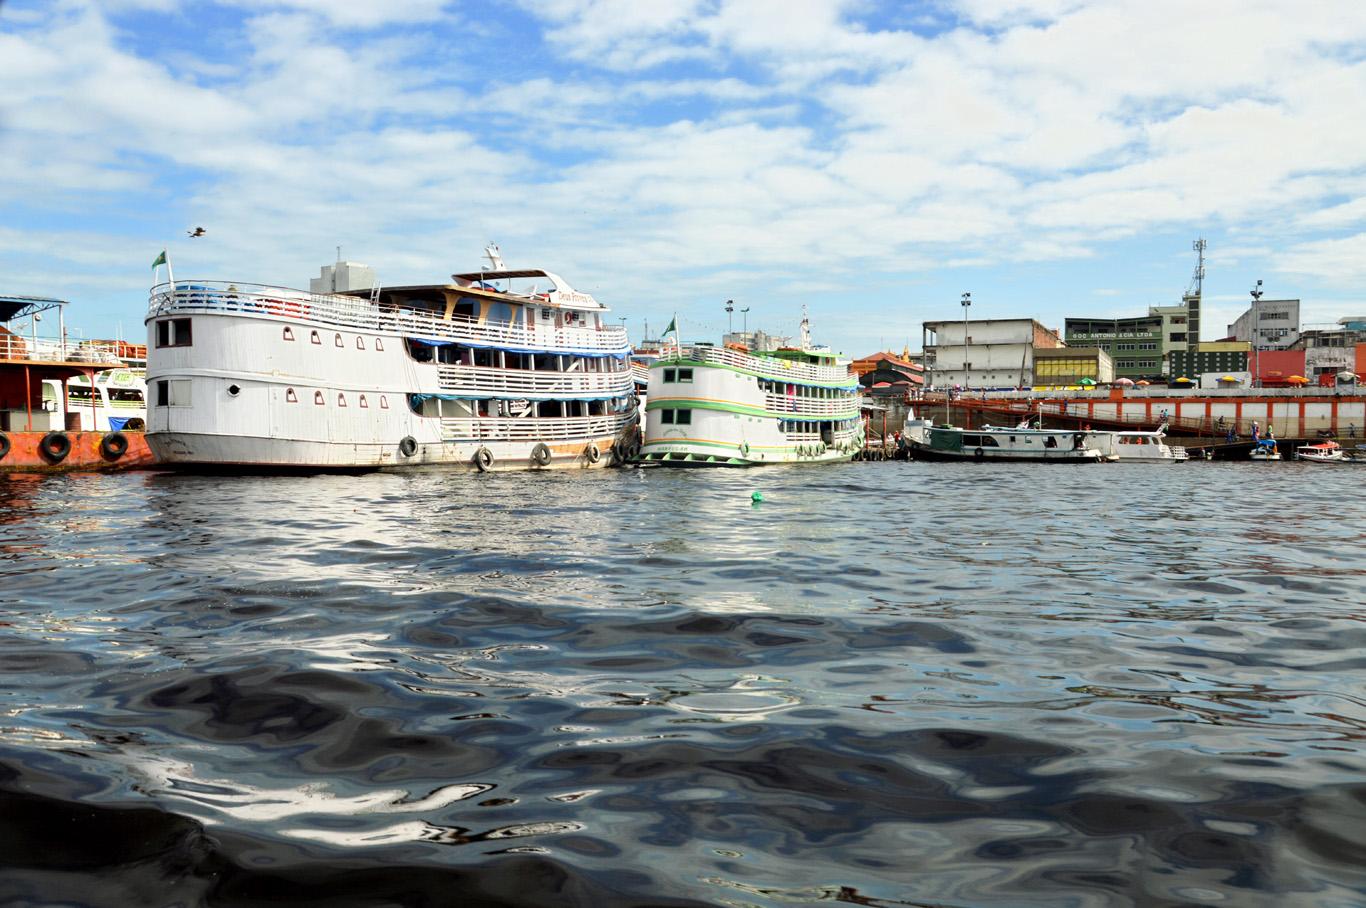 The Manaus Port